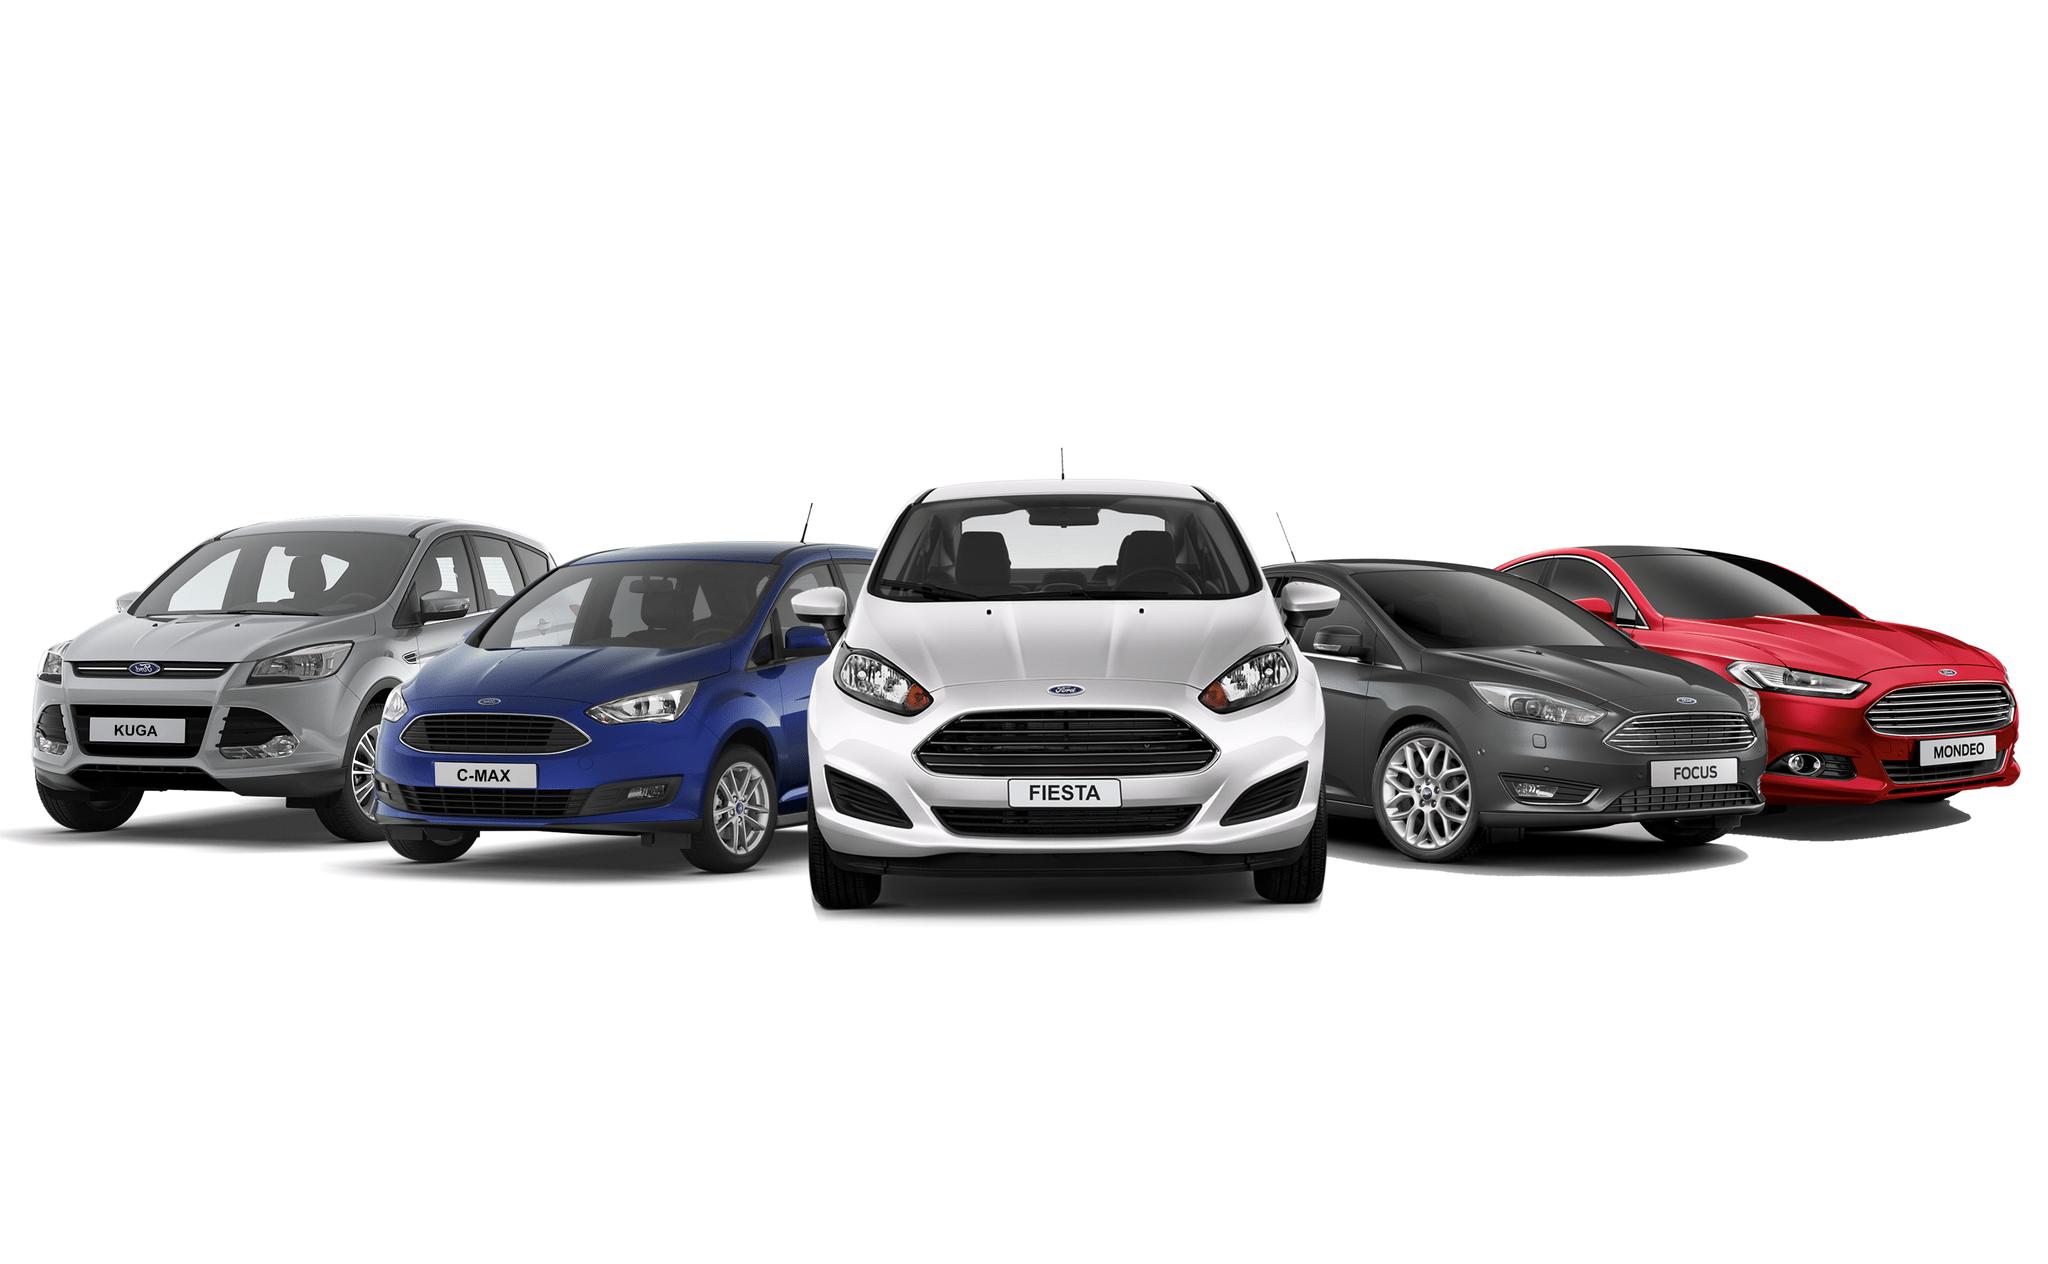 Dubai Police Car Wallpapers Cavanaghs Announces Ford 7 Year Warranty On All Cars For 2017